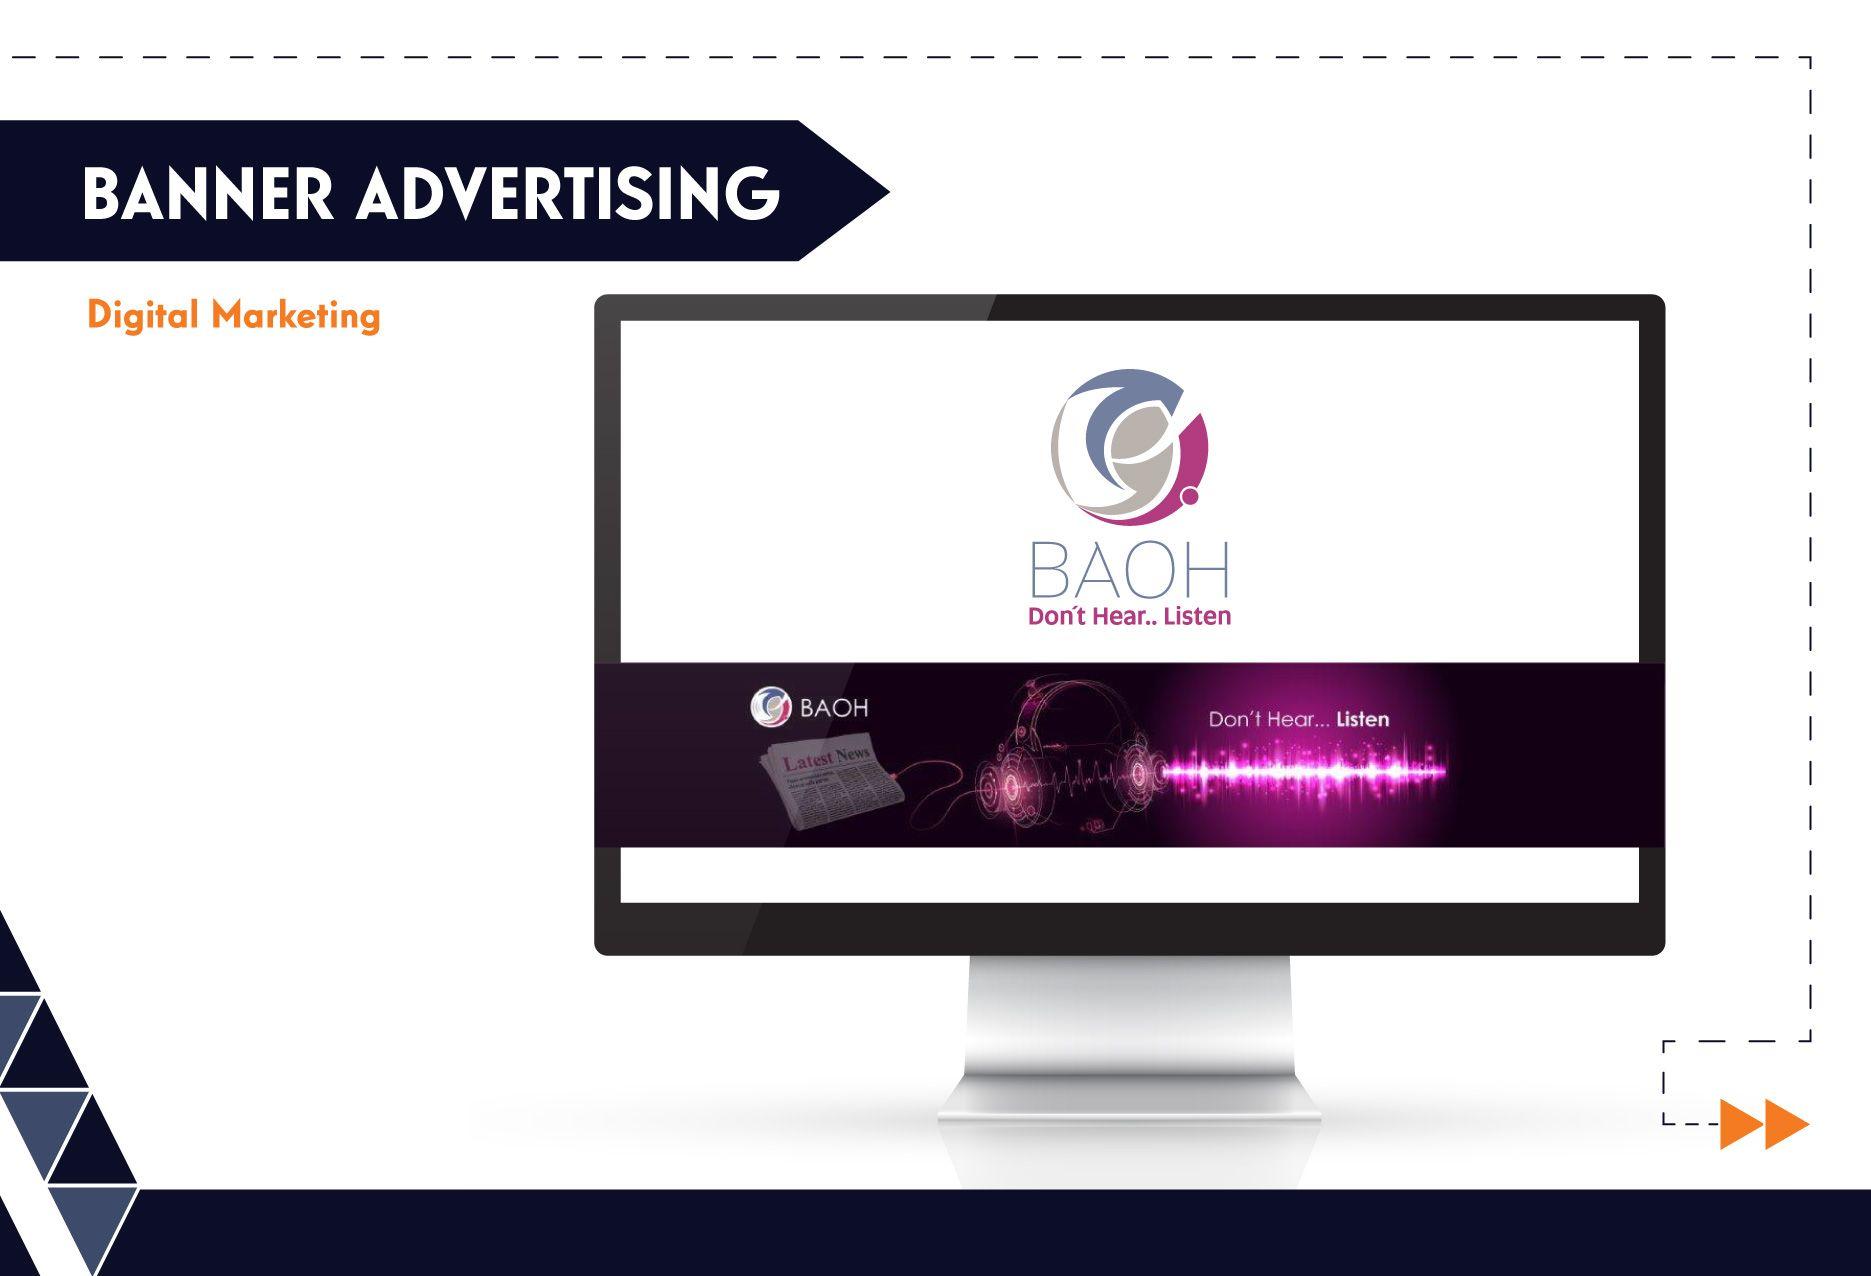 BAOH - Banner Advetising